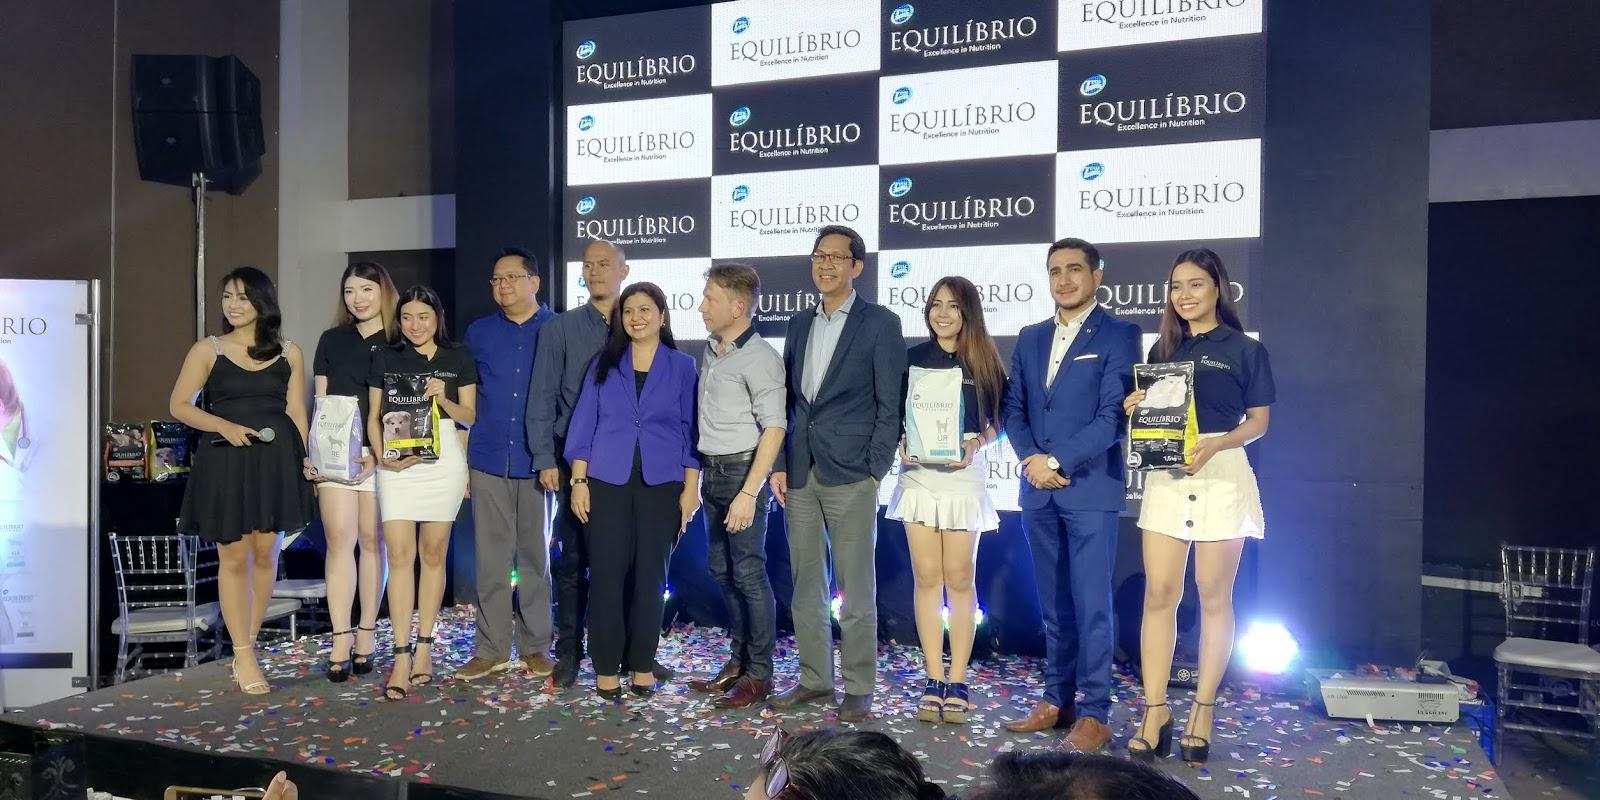 Equilibrio Launches New Line Of Super Premium Cat Dog Food In The Philippines Blog Ph Com Philippine Lifestyle News